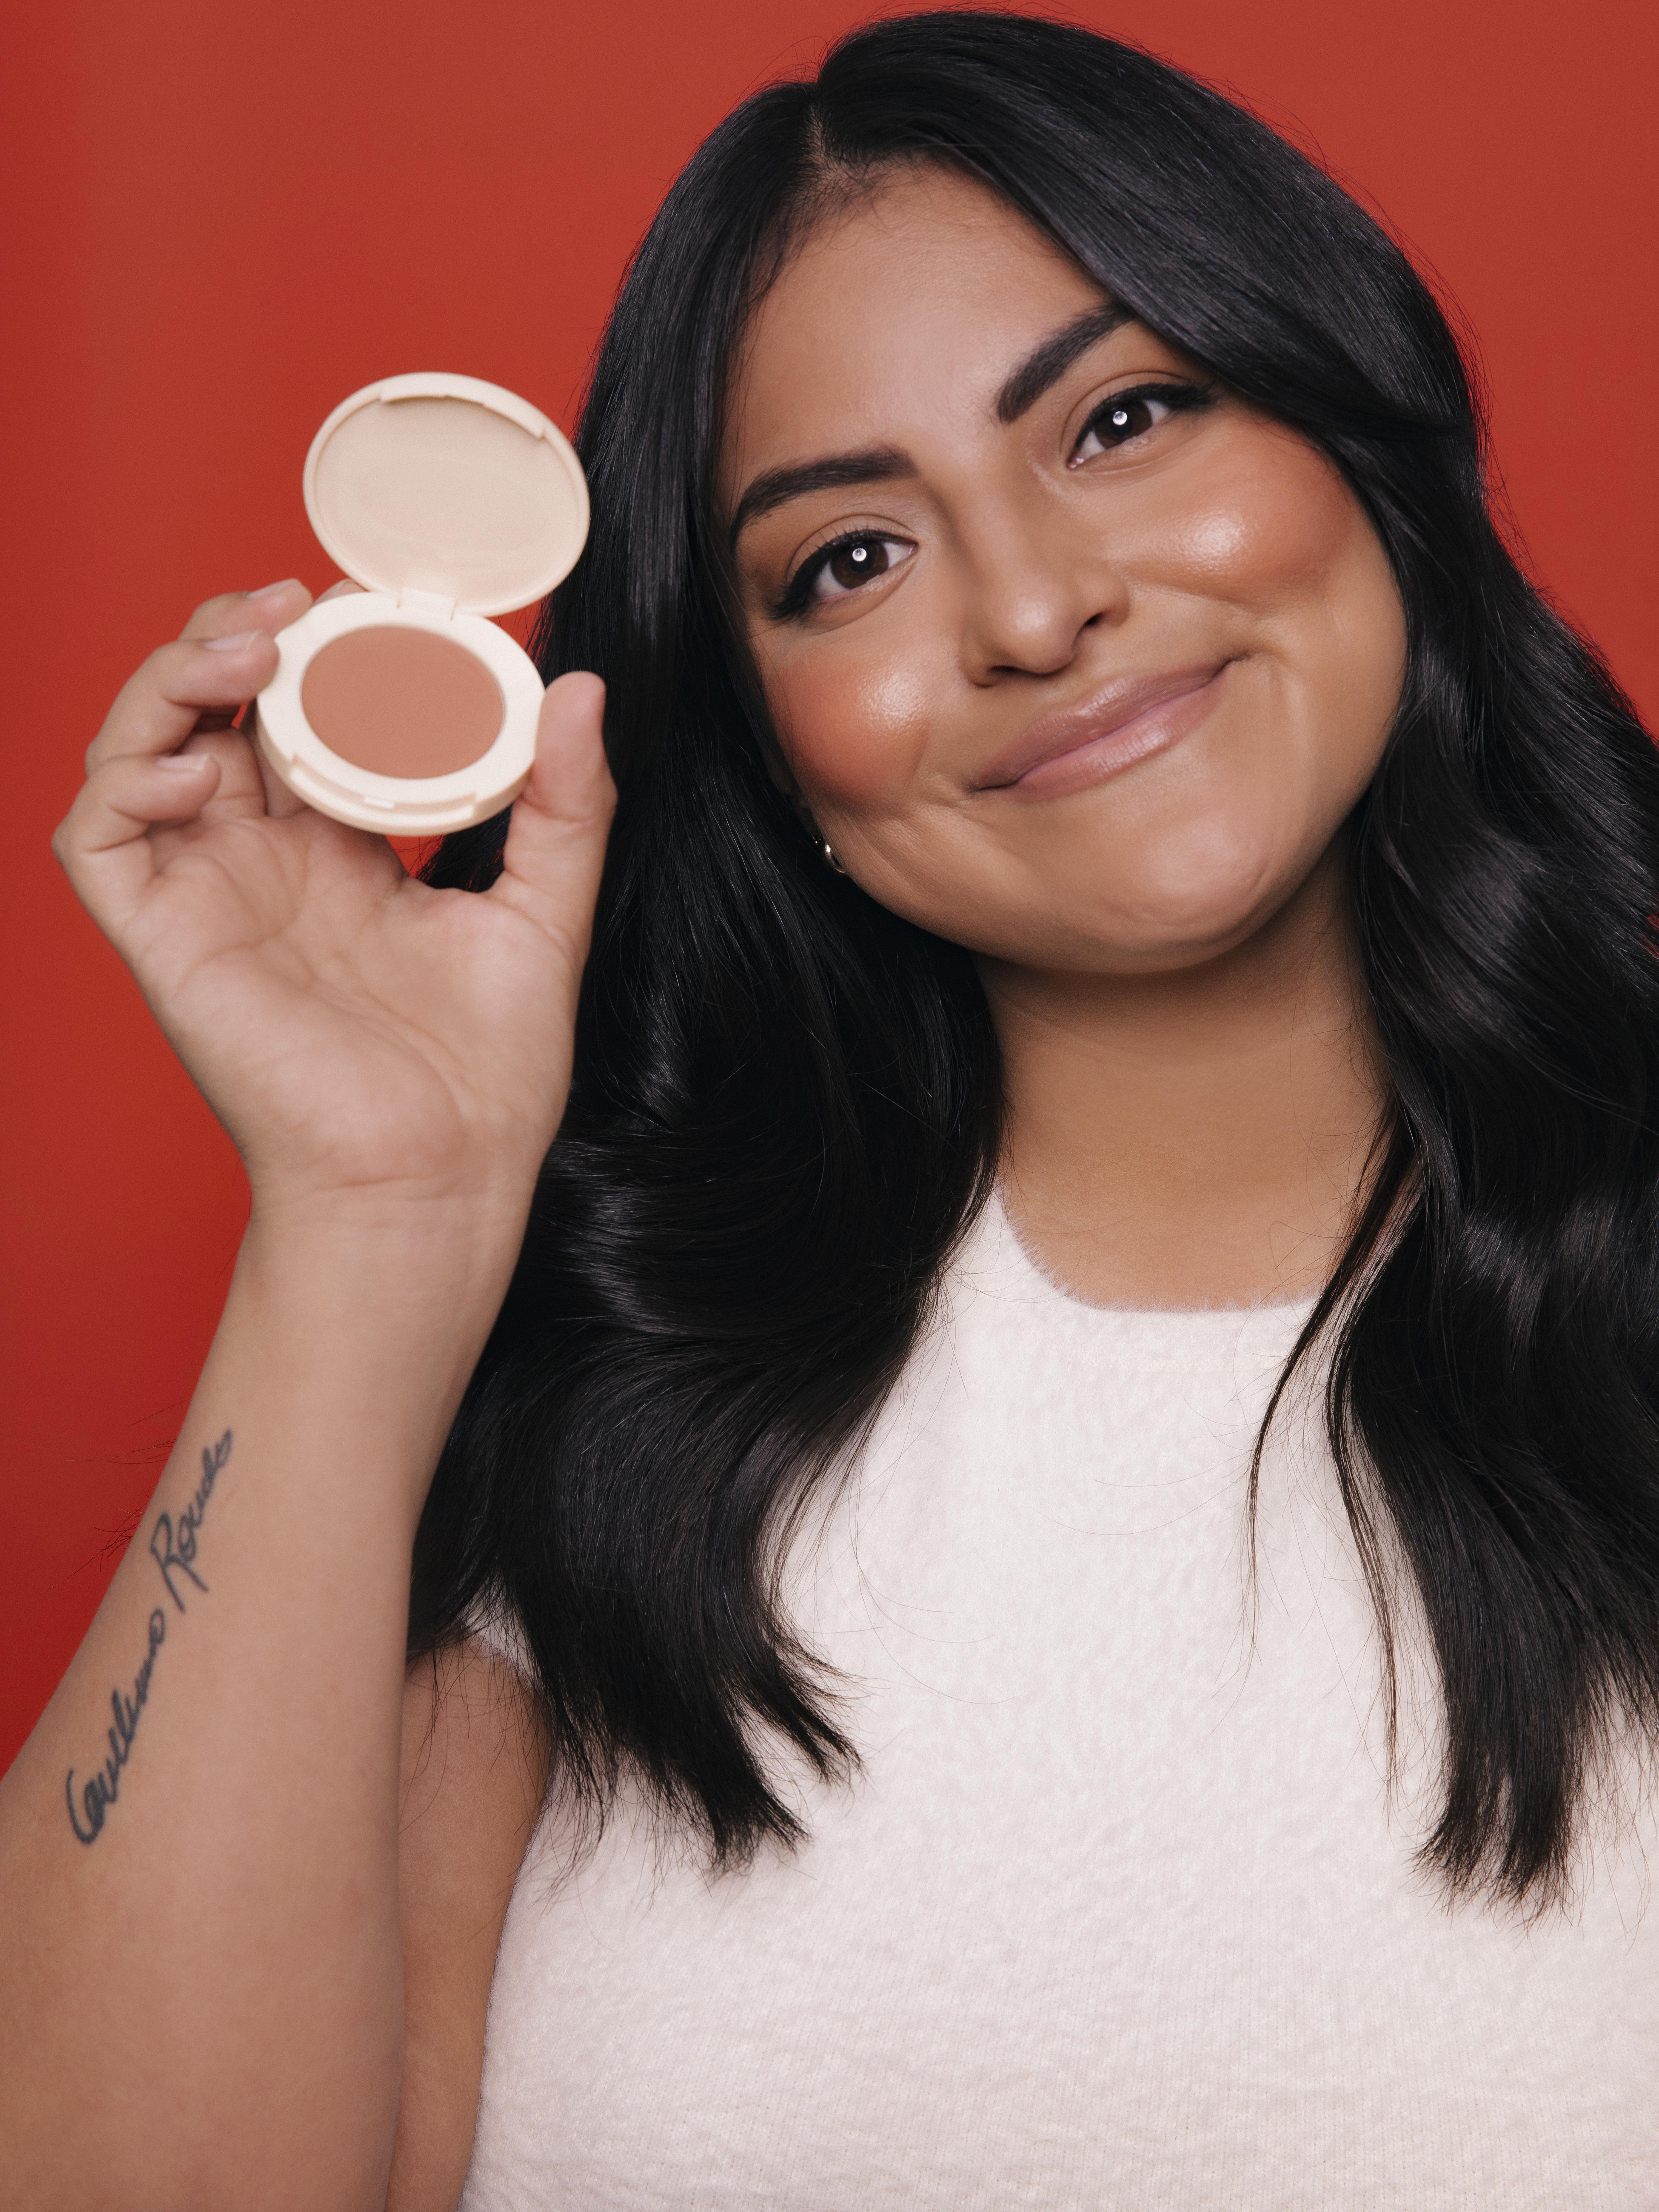 Jamie Makeup Blighlighter Campaign